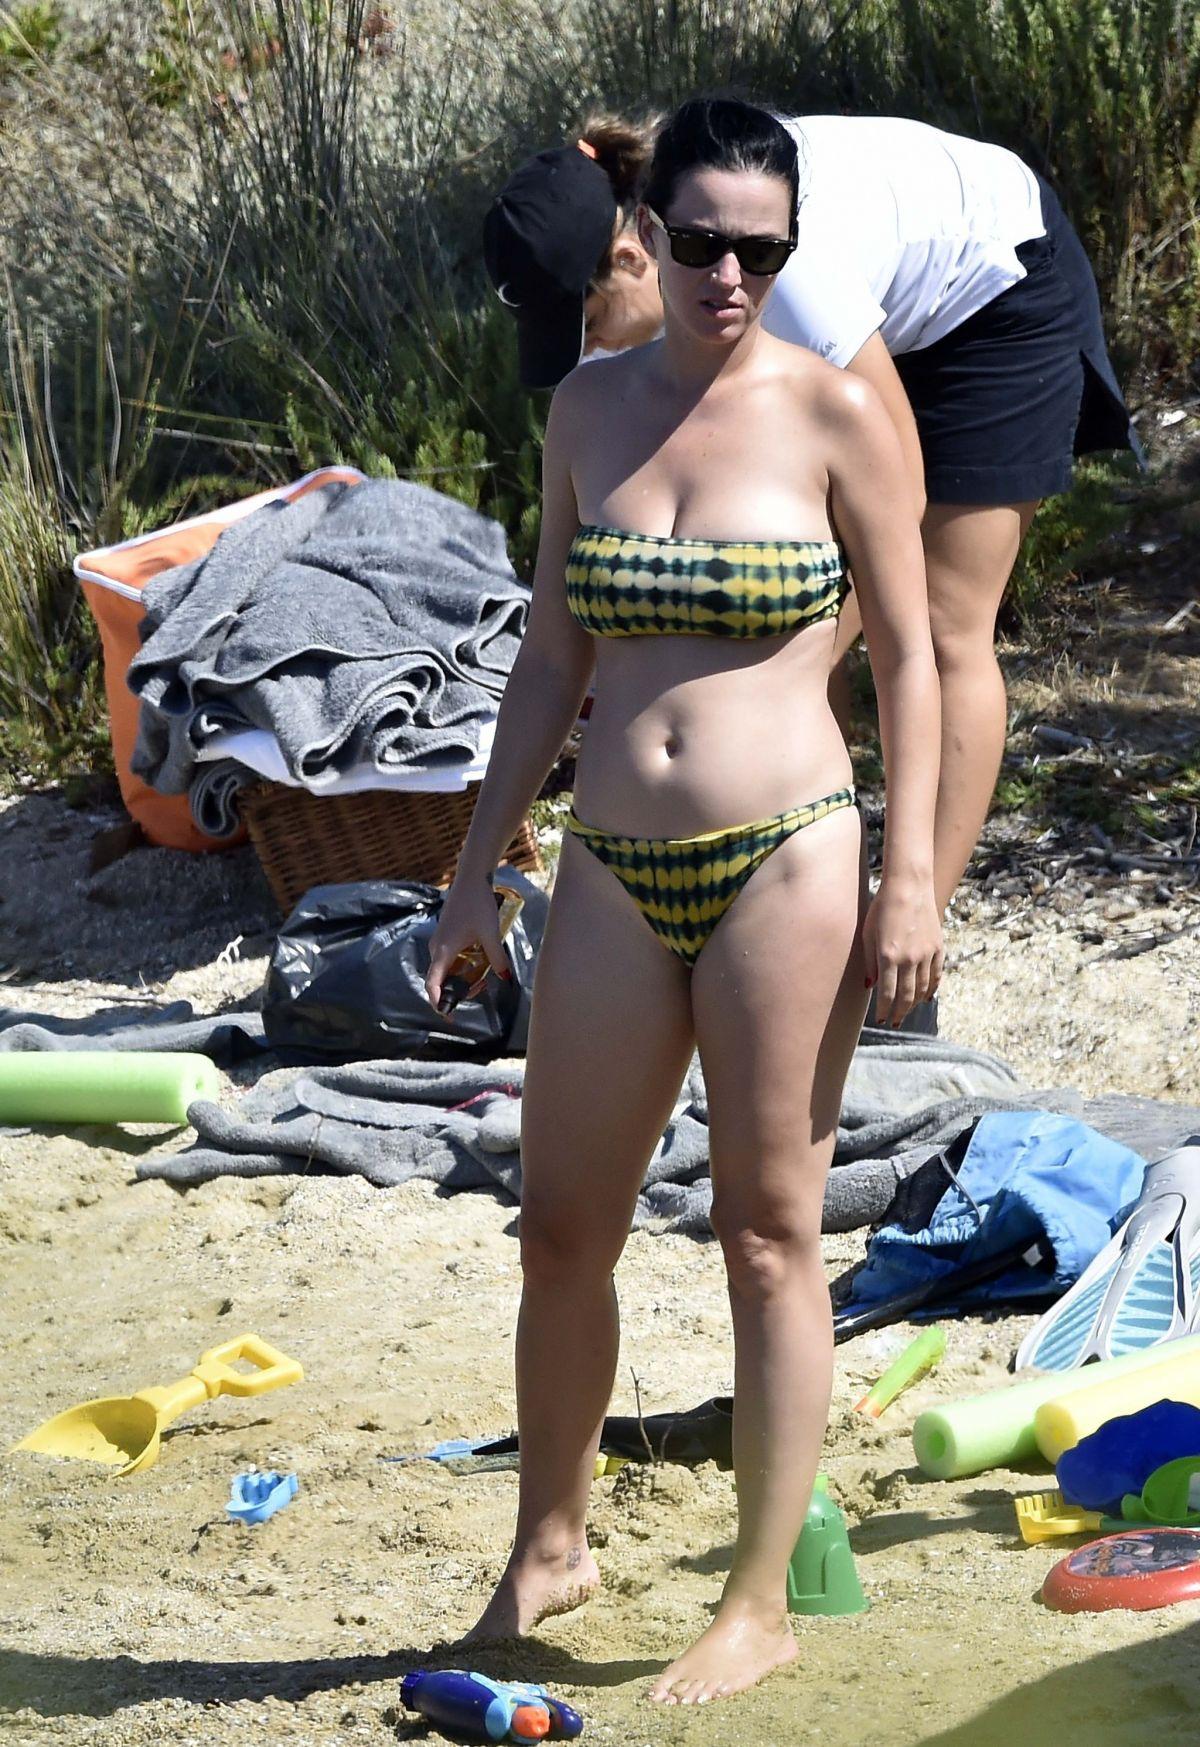 katy-perry-naked-legs-girl-with-dreadlocks